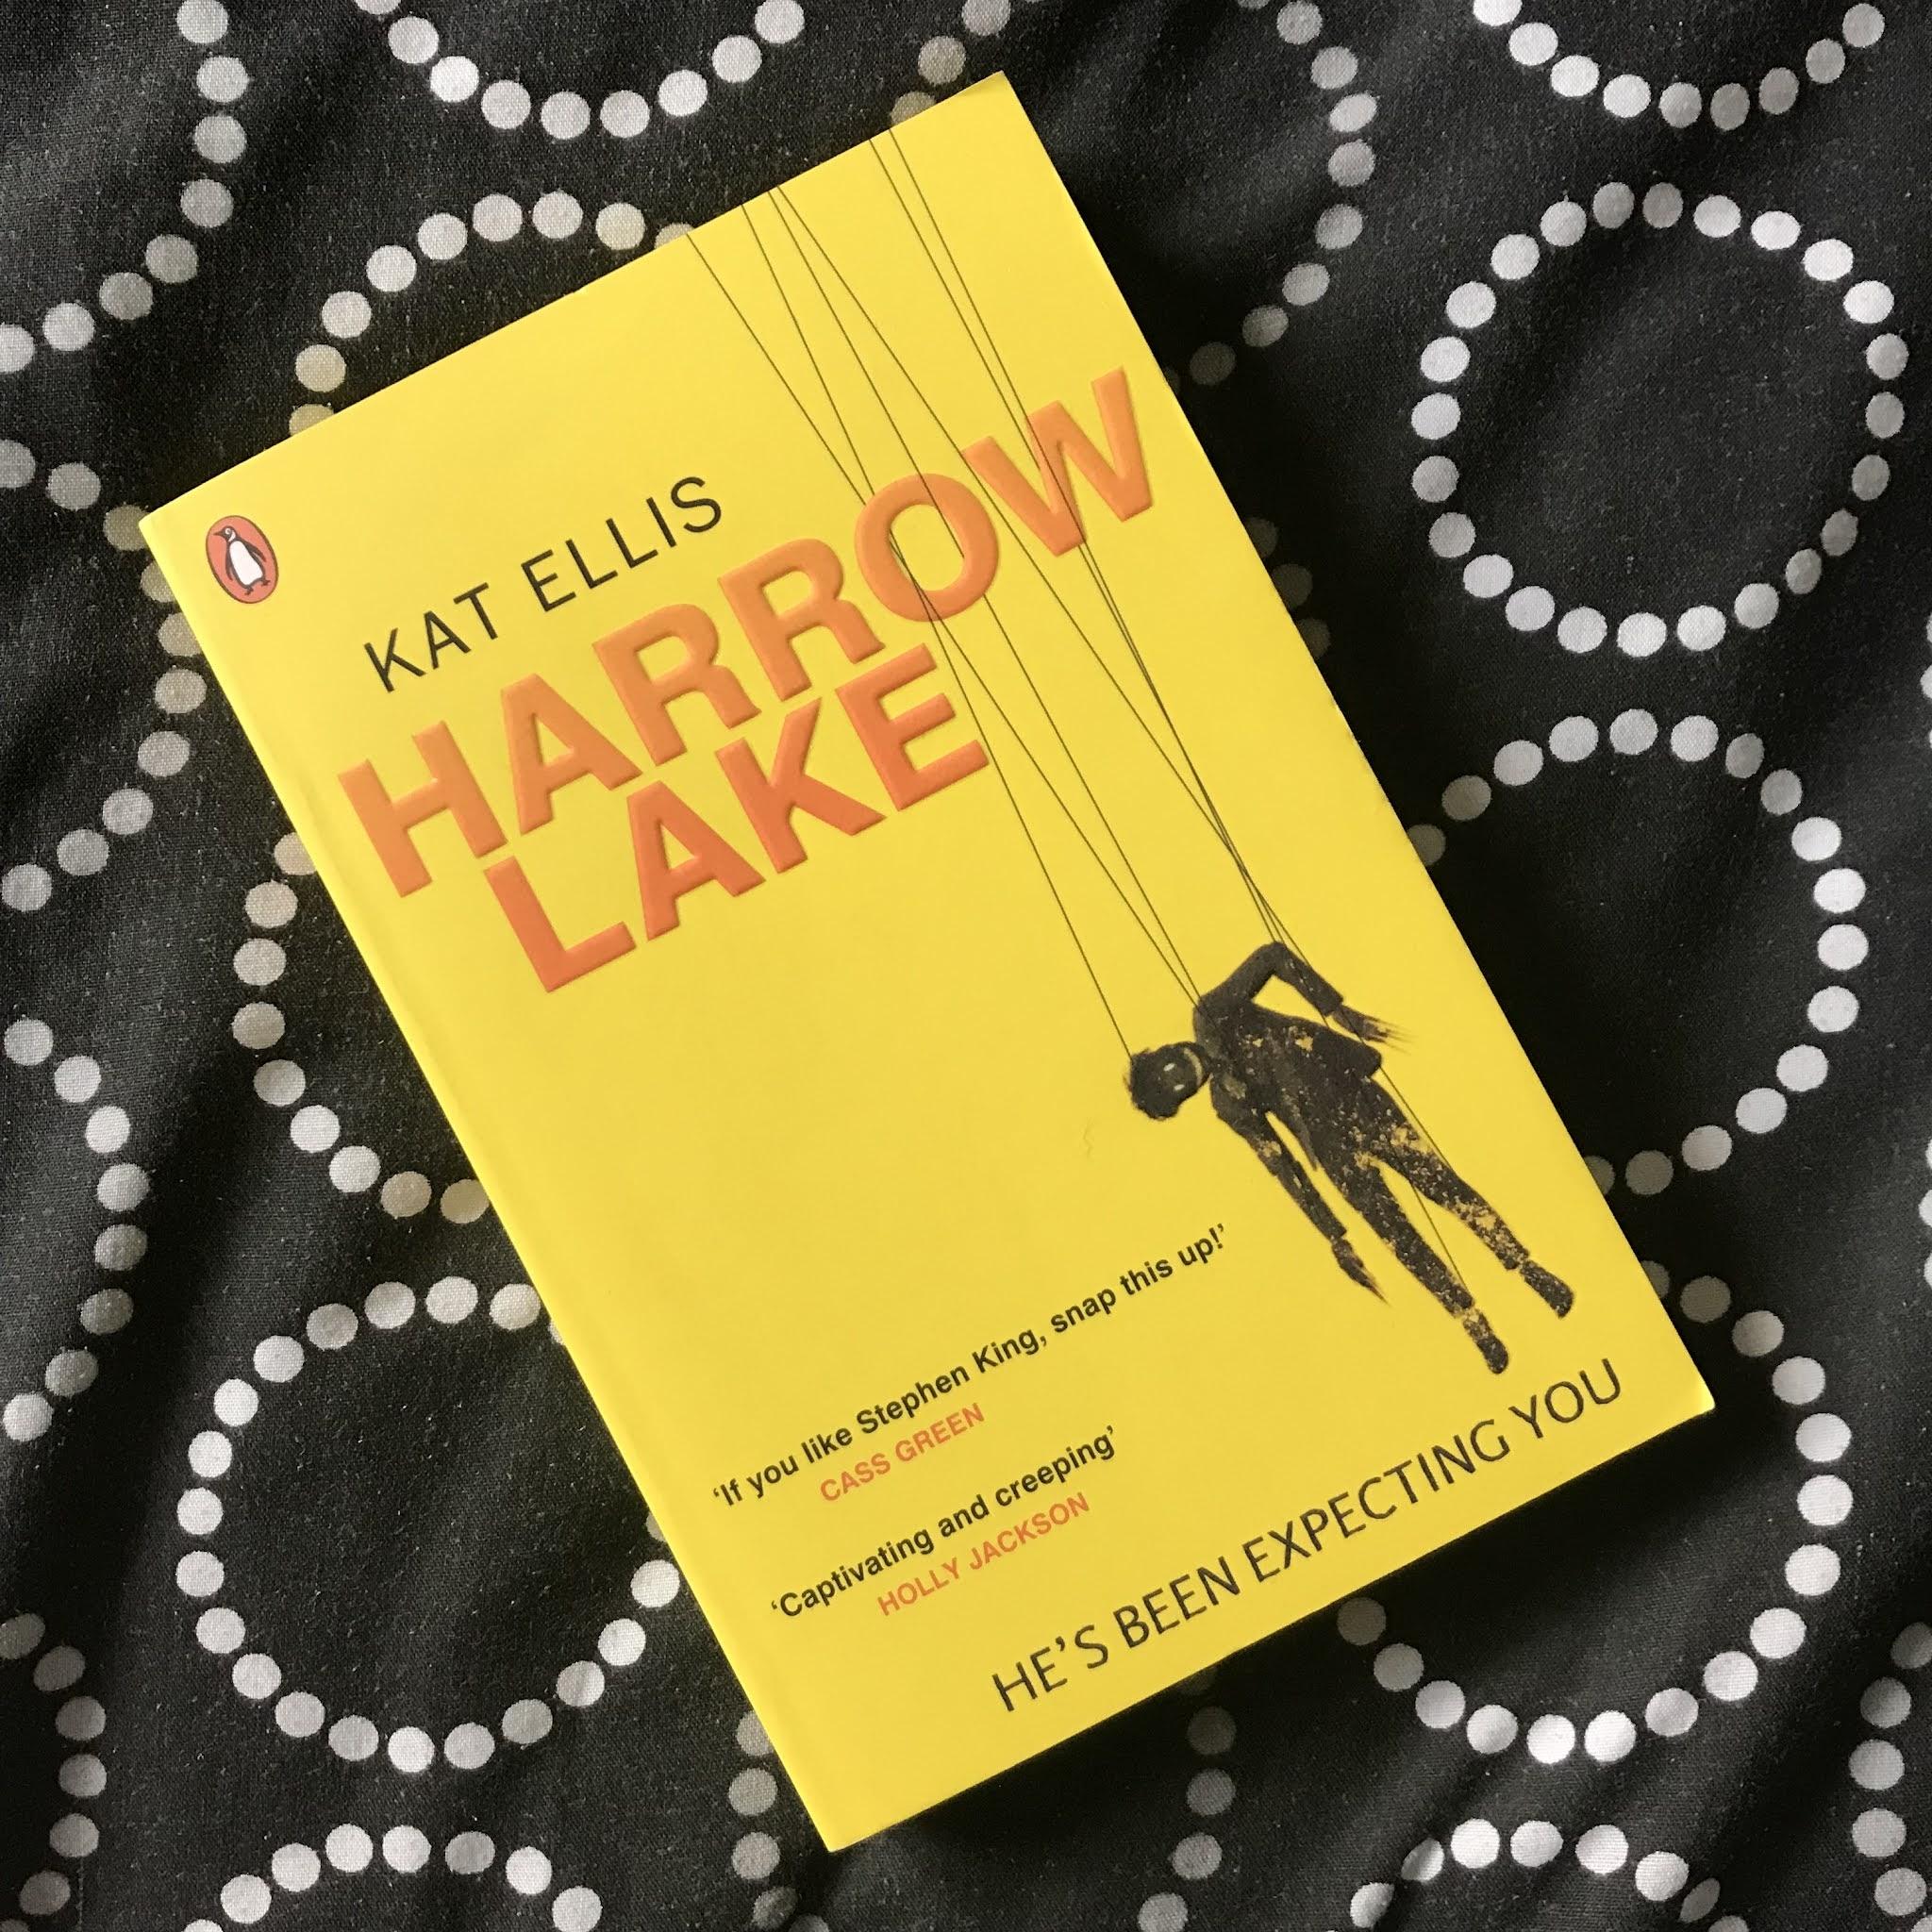 Harrow Lake by Kat Ellis